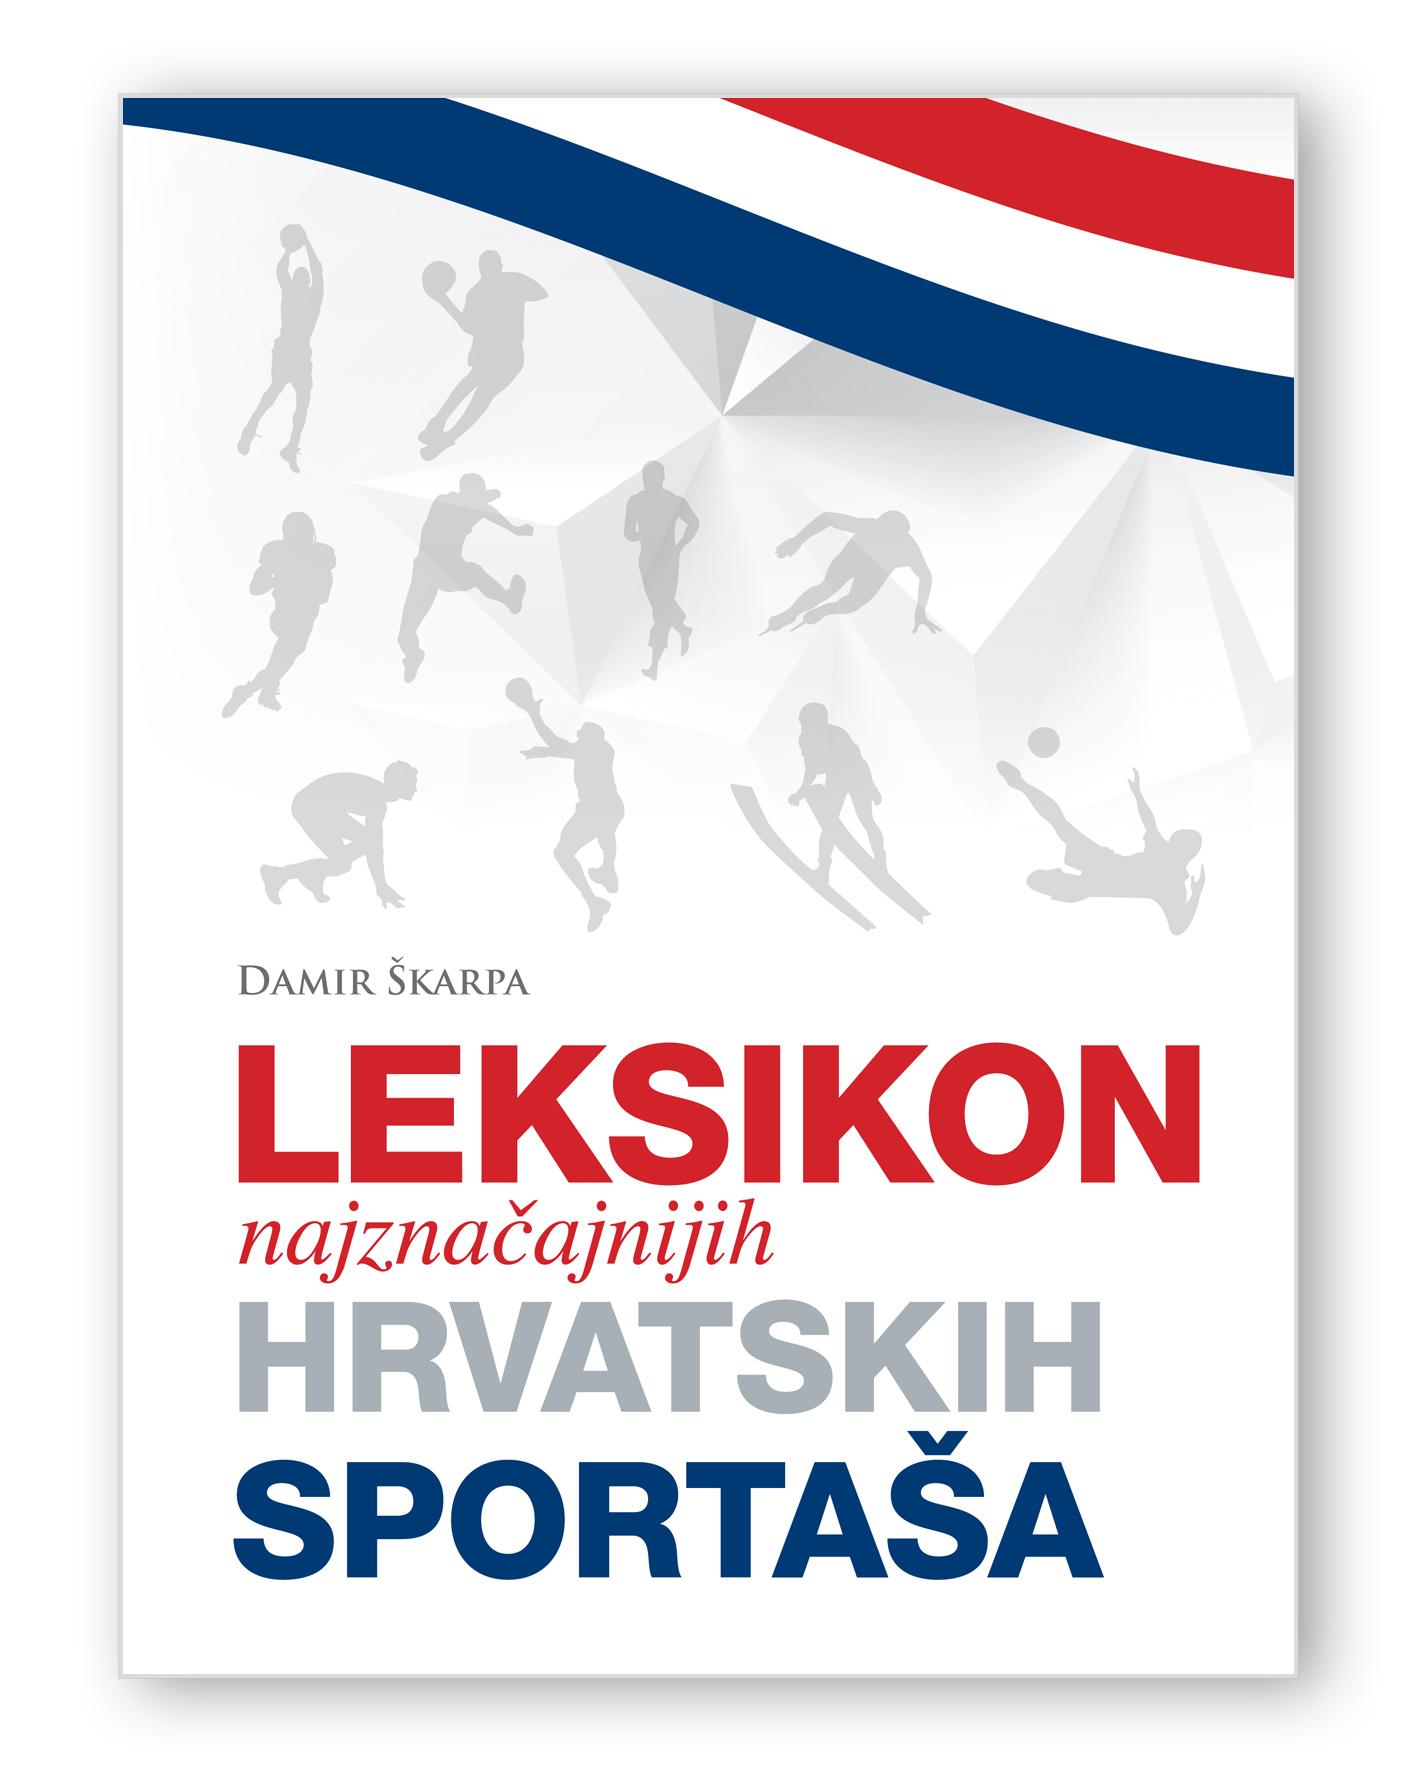 Damir Škarpa: Leksikon najznačajnijih hrvatskih sportaša